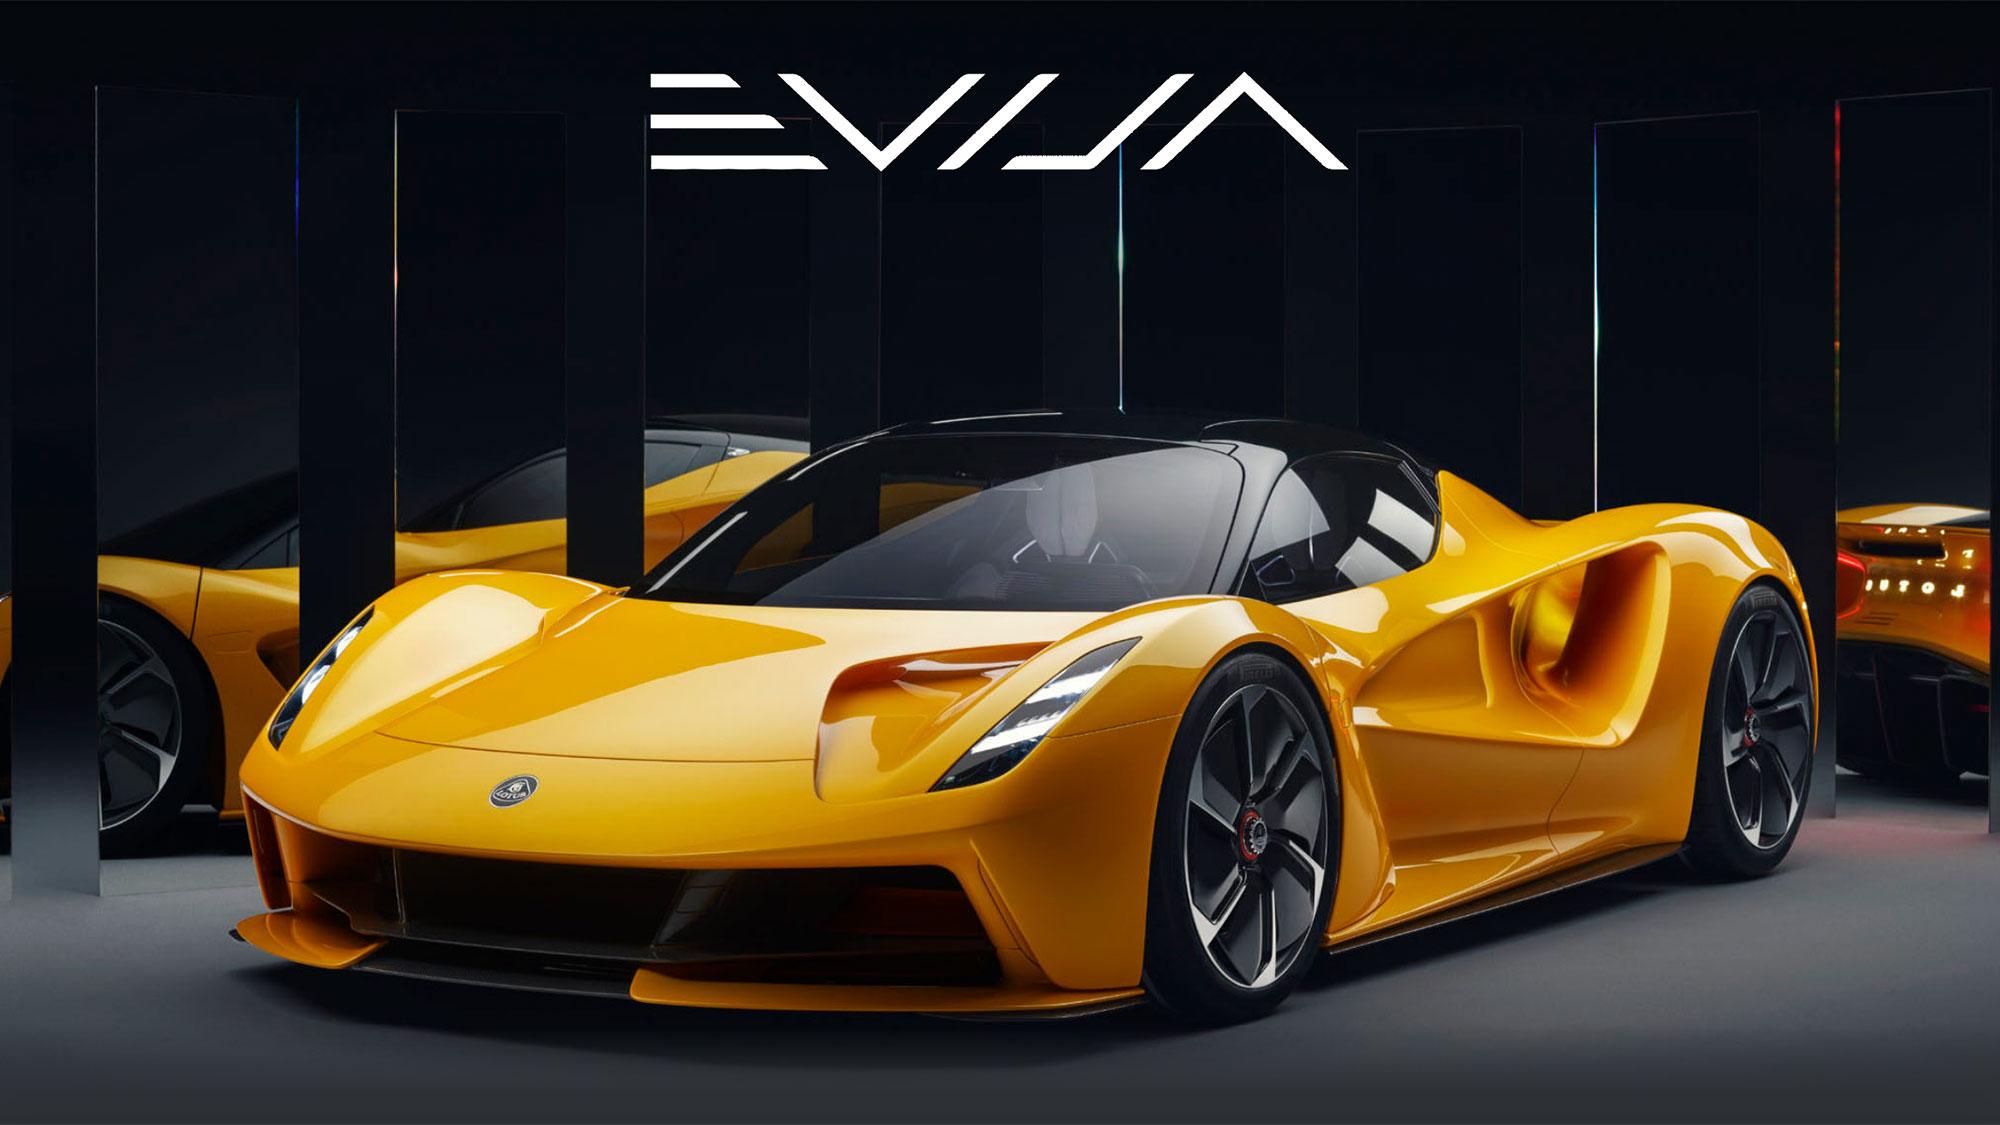 Lotus Evija All-electric Hypercar in Solaris Yellow